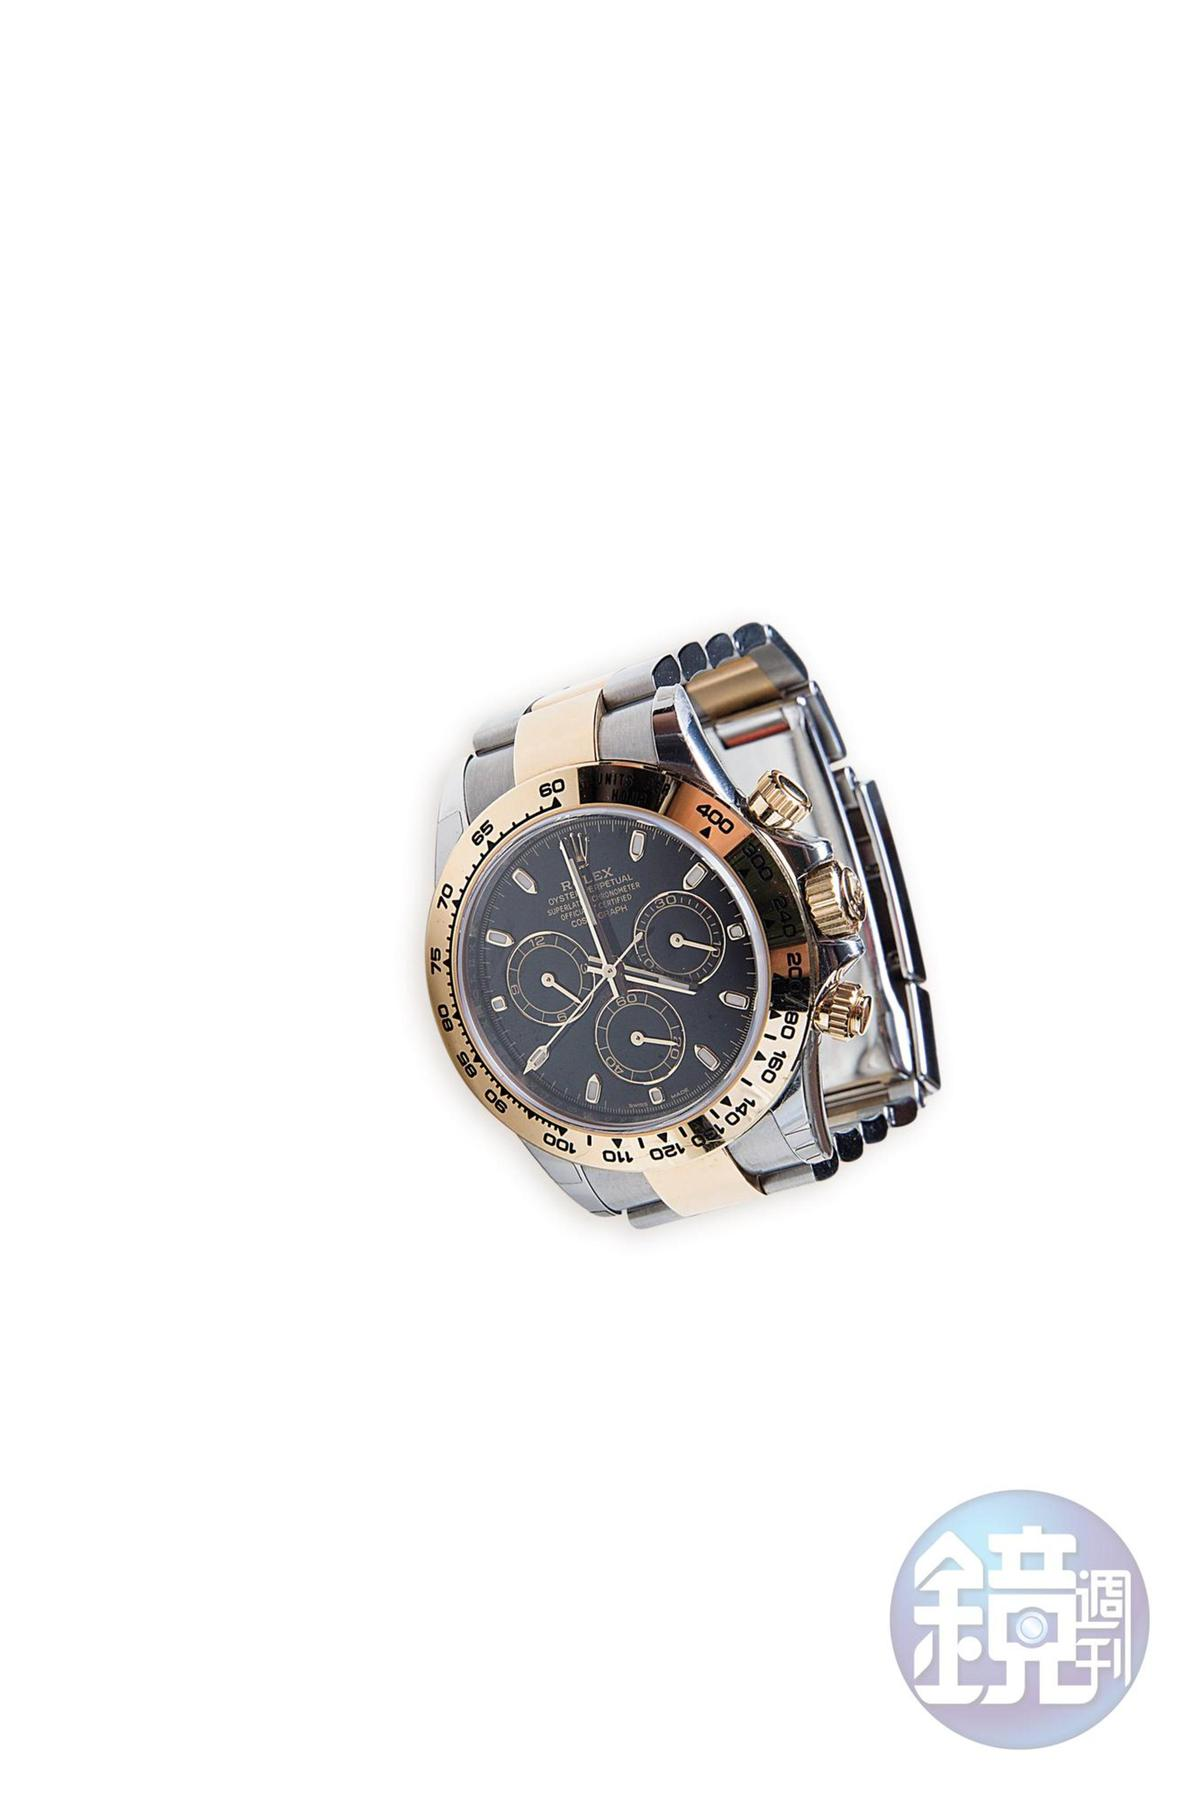 ROLEX手錶是今年的畢業禮物。約NT$520,000